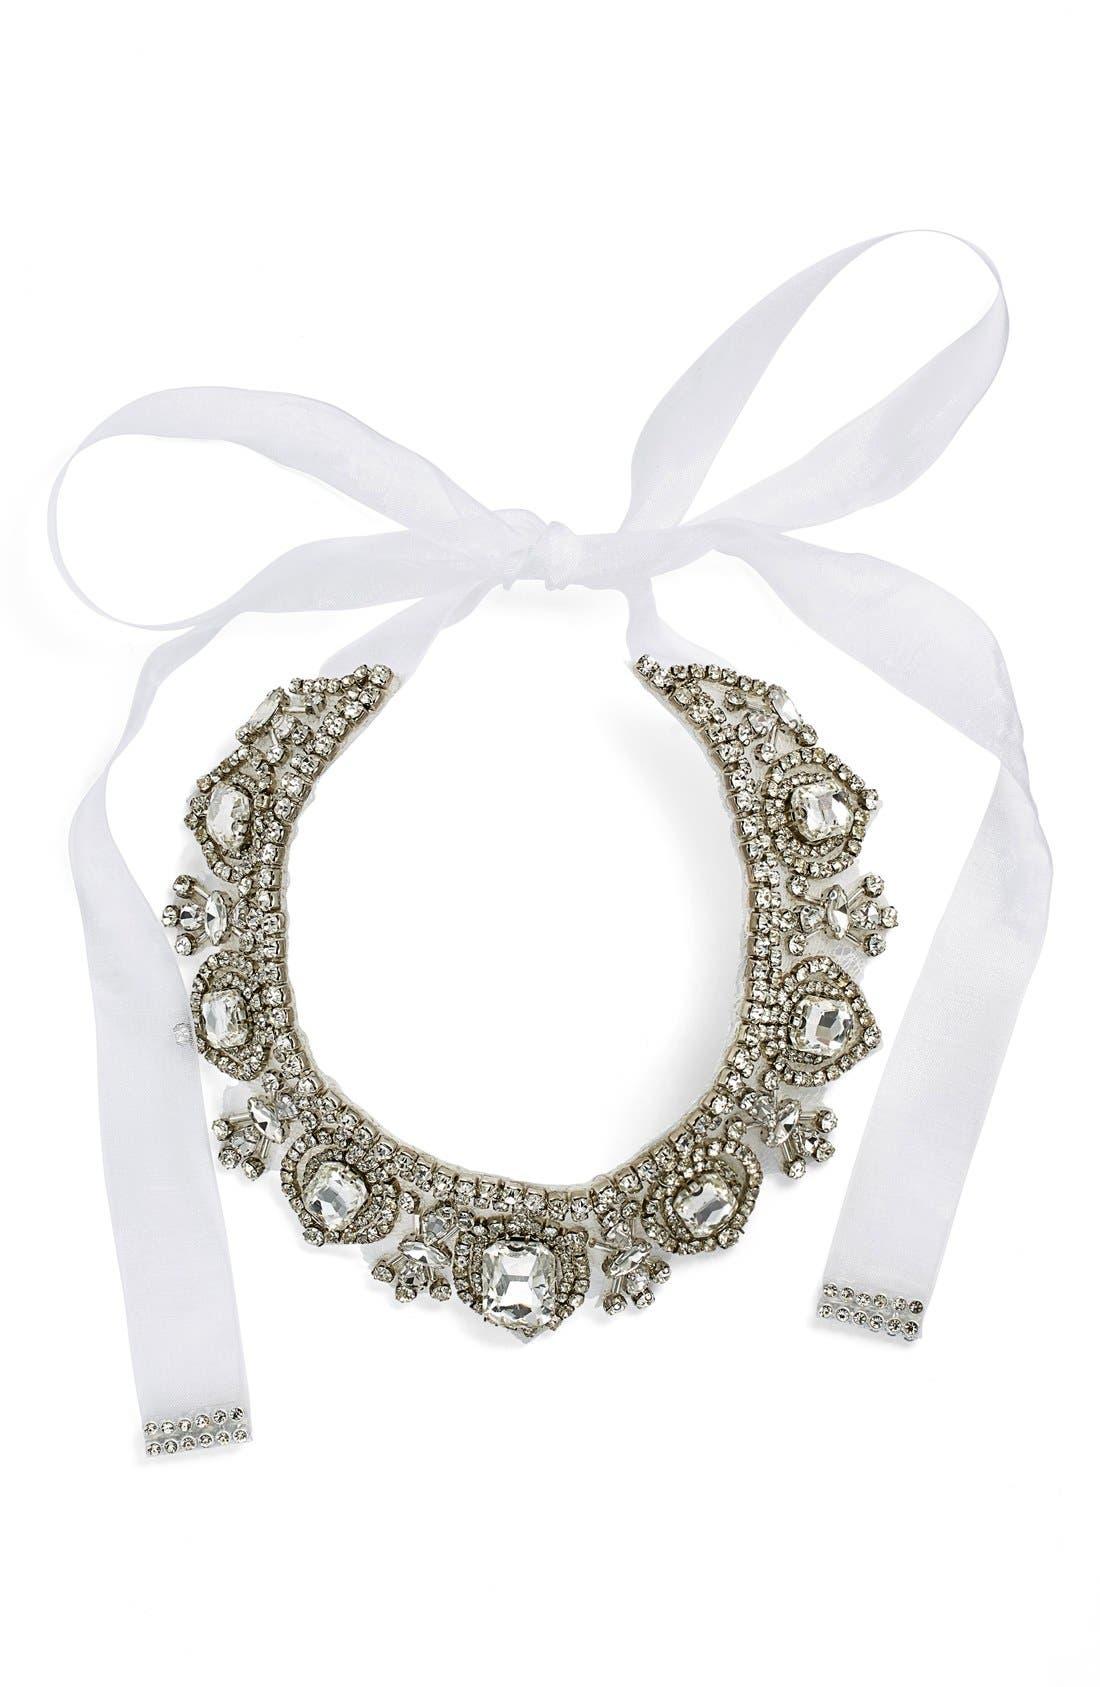 Nina 'Glamorous' Tie Collar Necklace